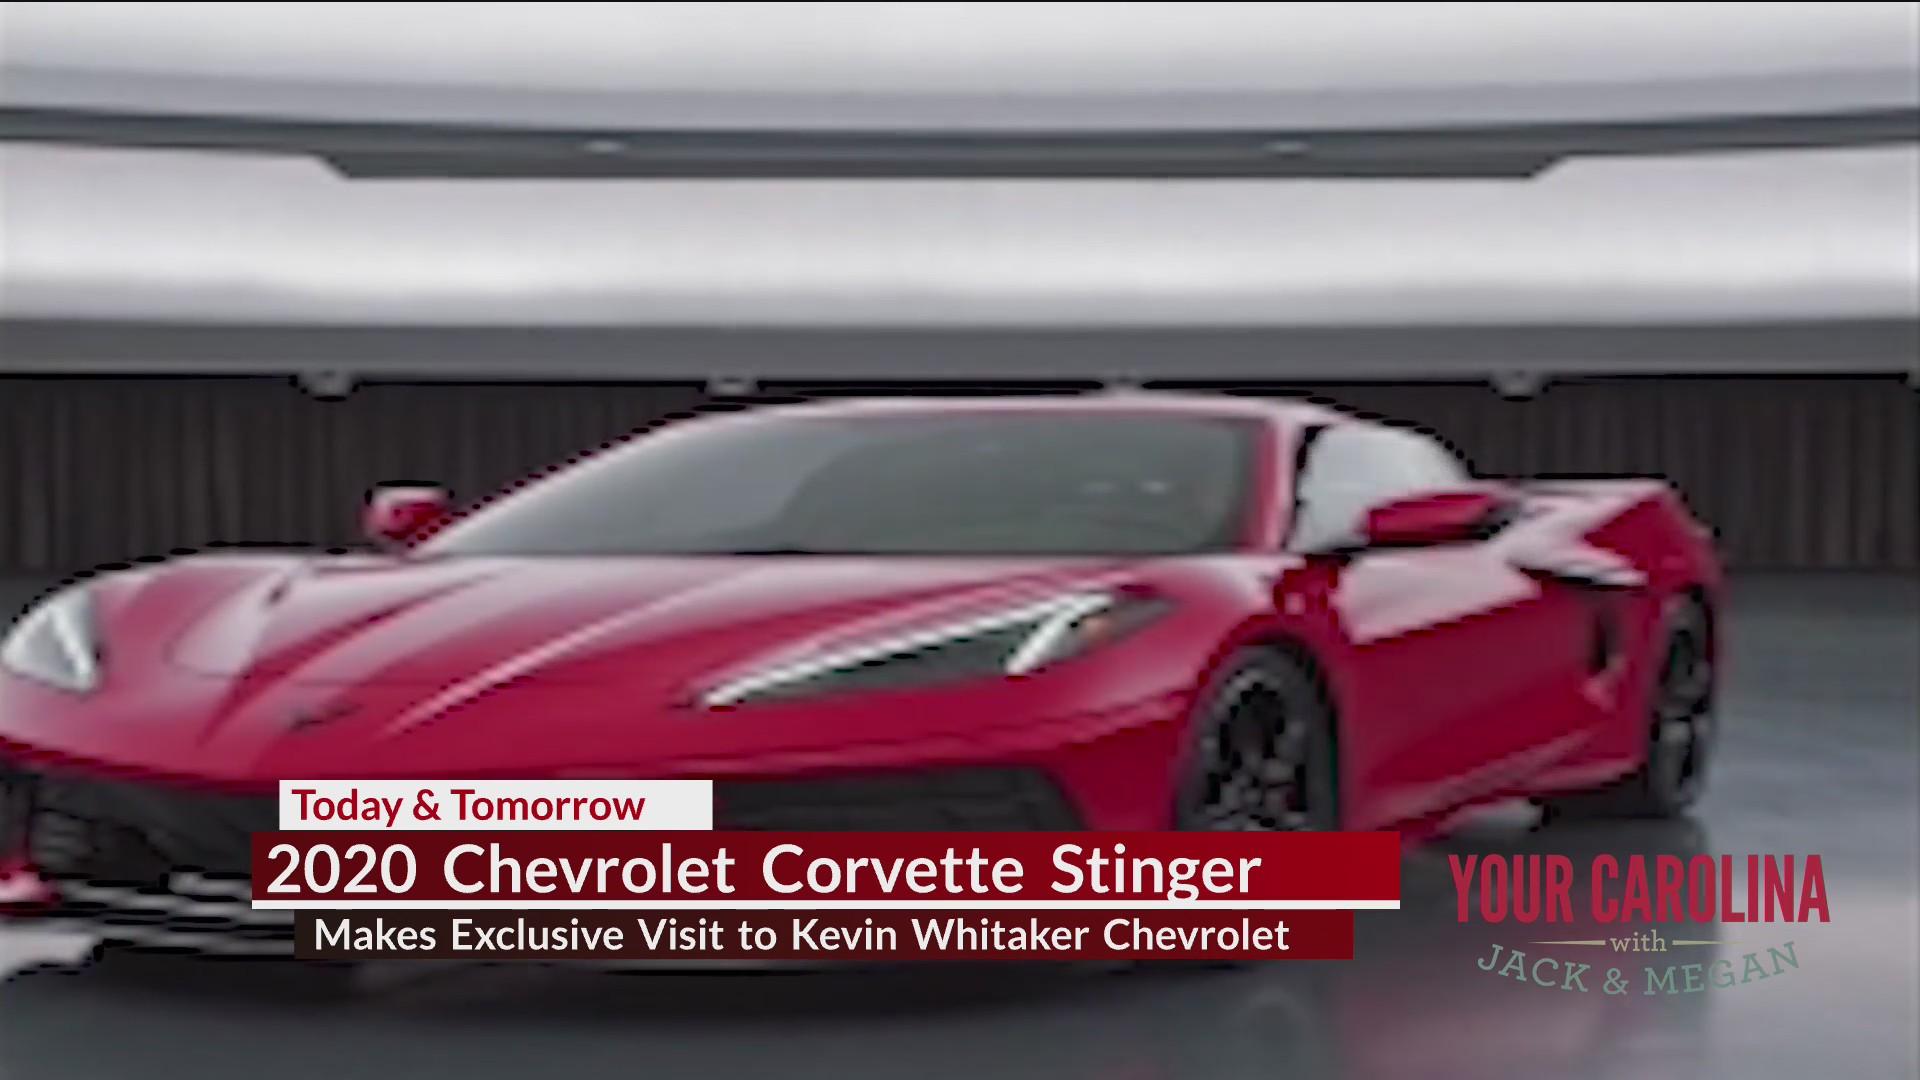 2020 Chevrolet Corvette Stinger Makes Exclusive Visit To Kevin Whitaker Chevrolet